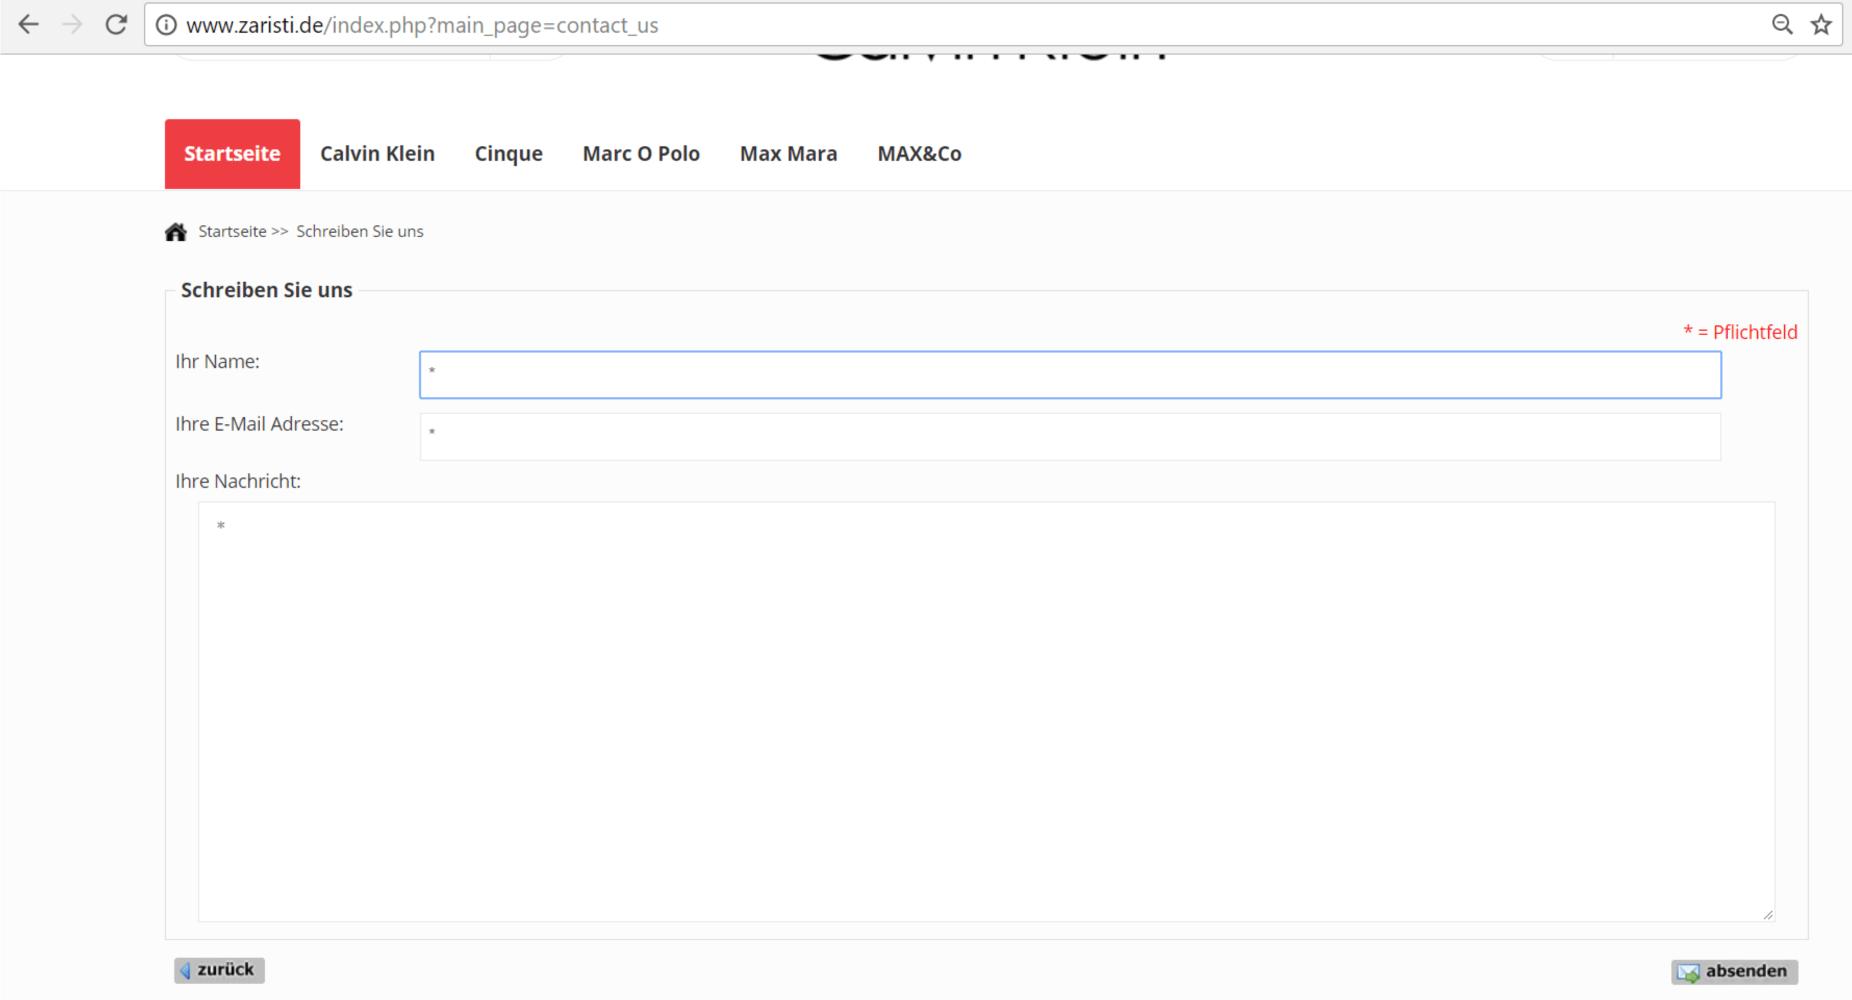 Kontaktformular eines Fake Shops